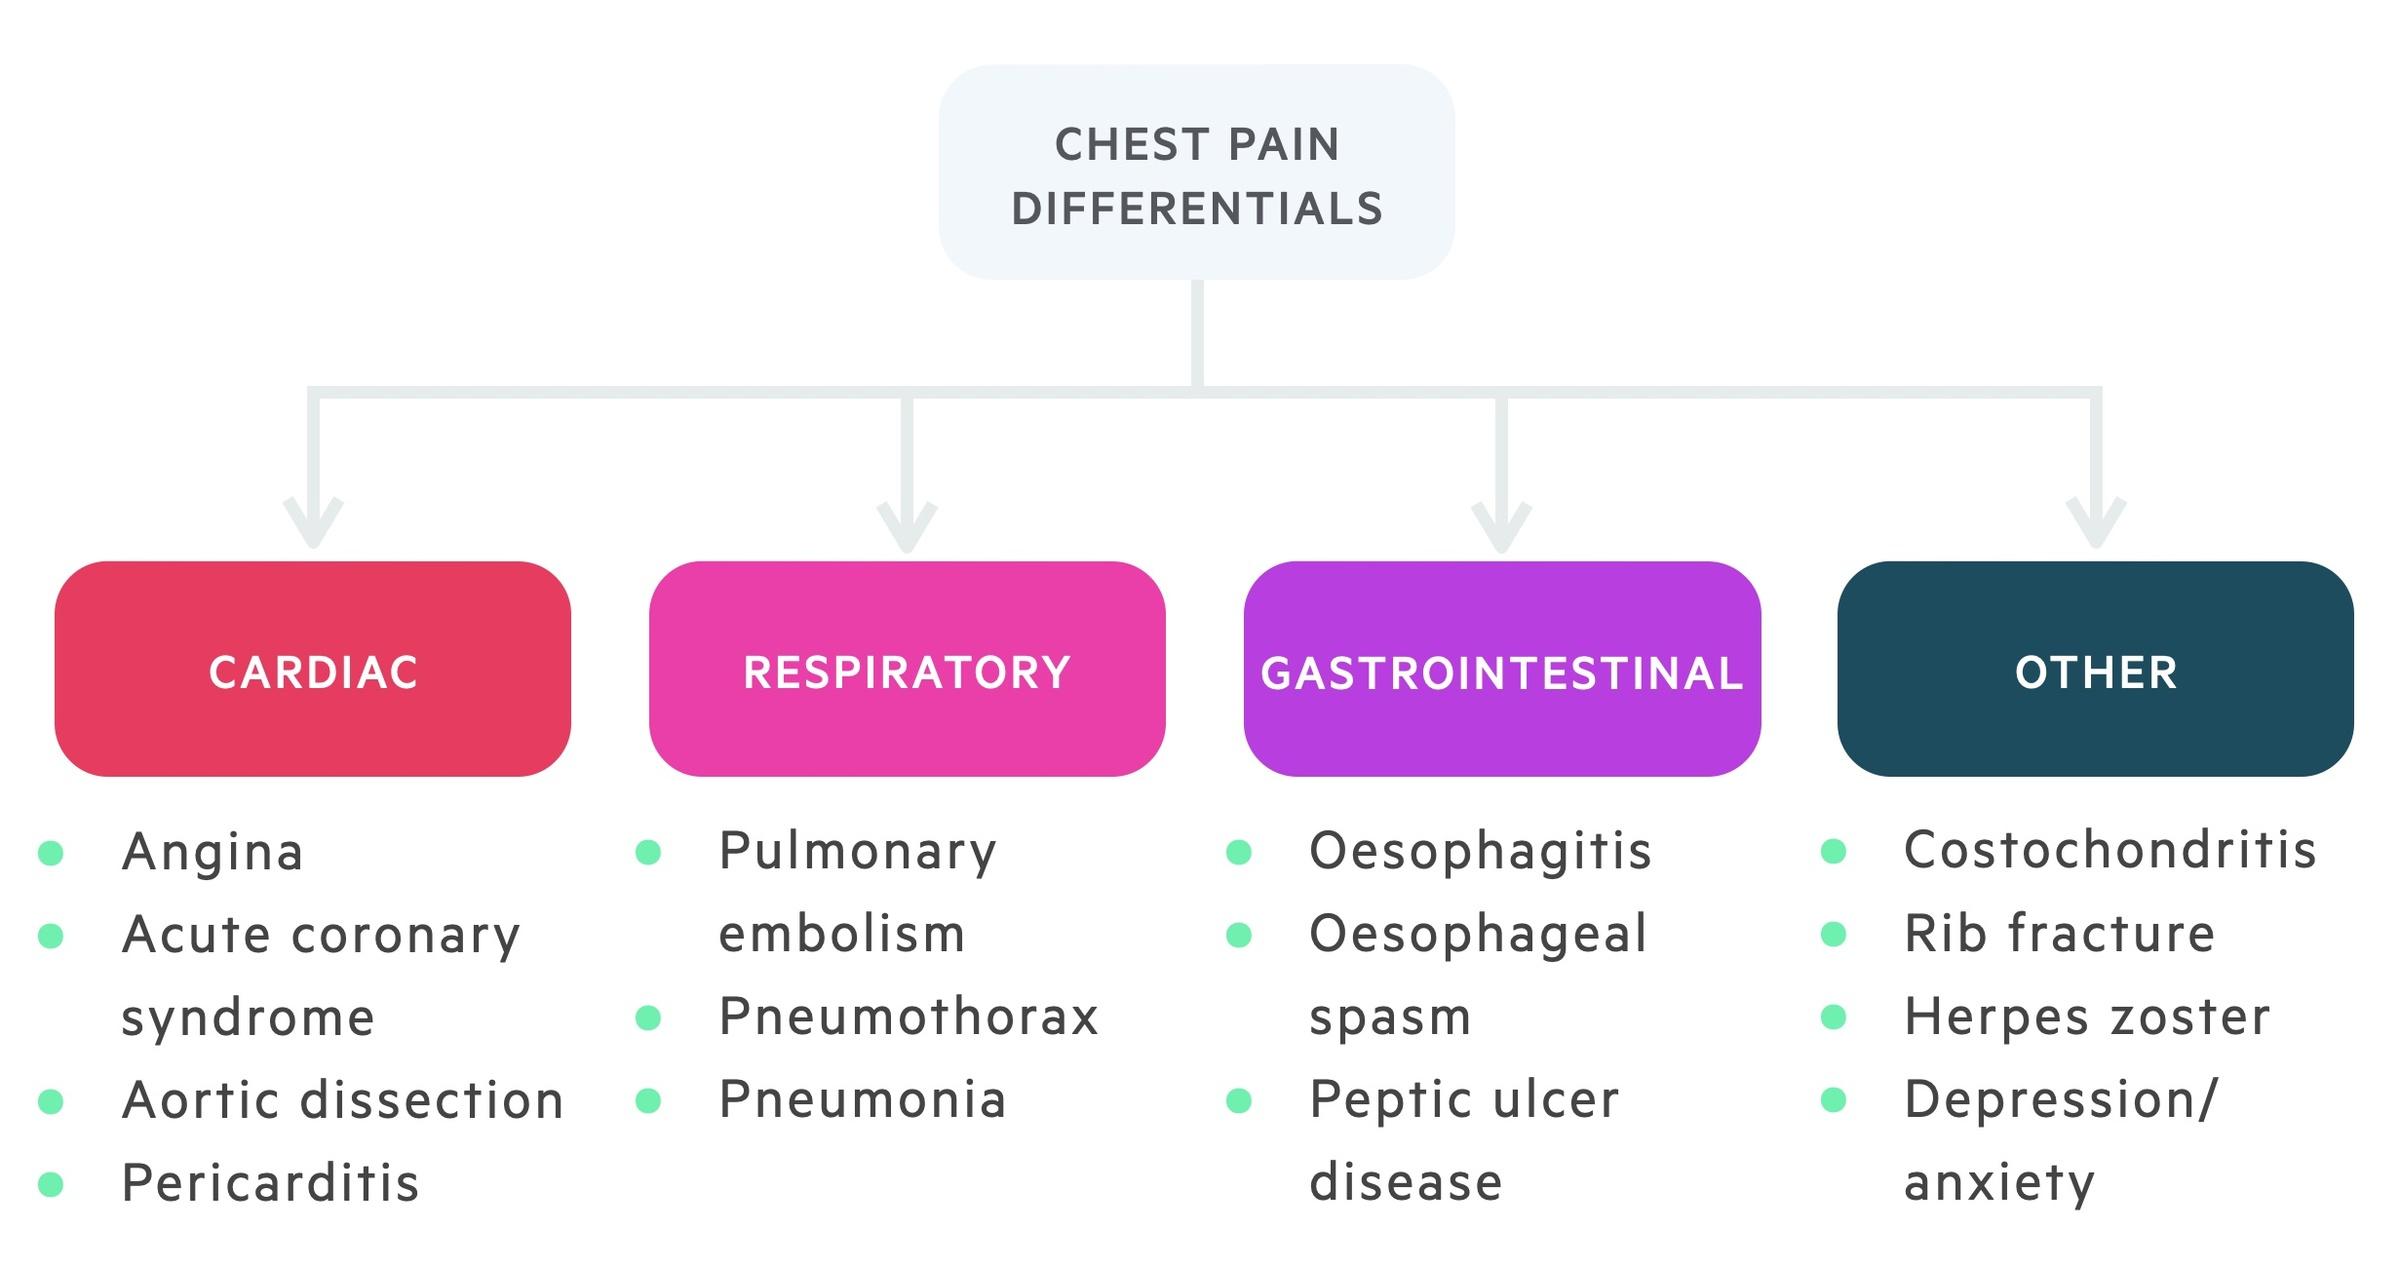 Chest pain differentials